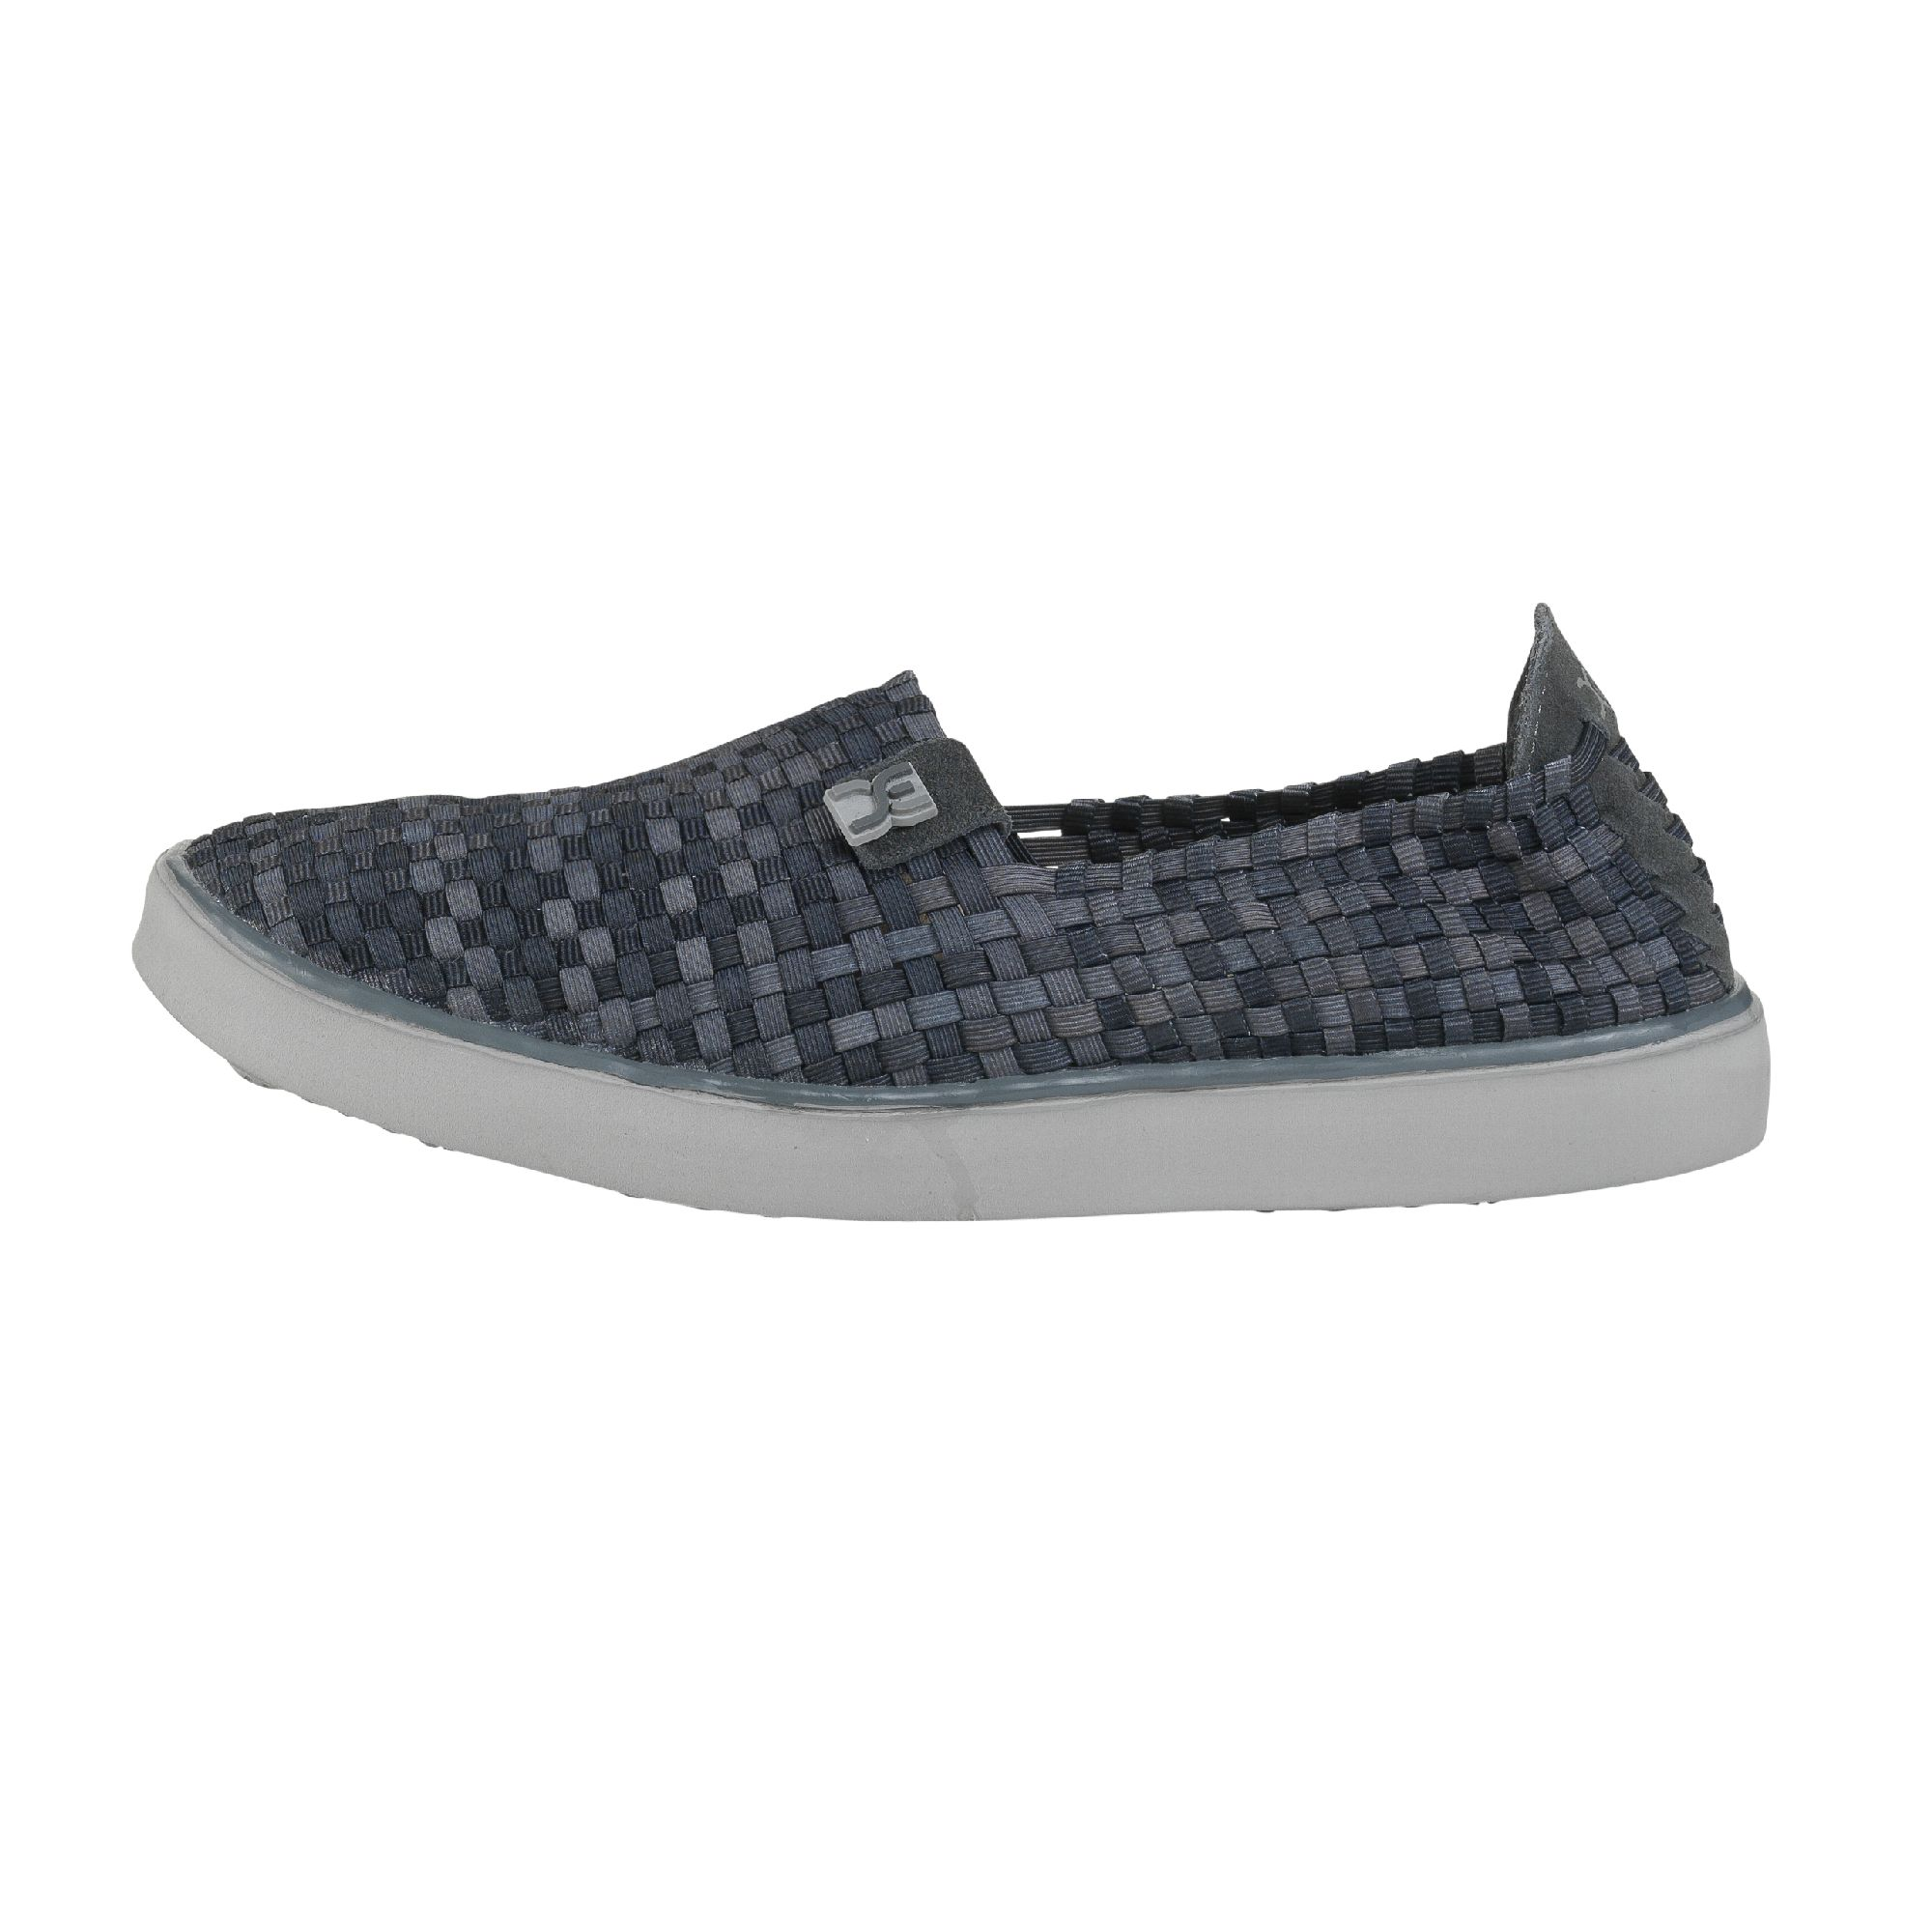 Dude Shoes Women's E-last Simple Funk Grey Slip On UK5 / EU38 uSihtfx